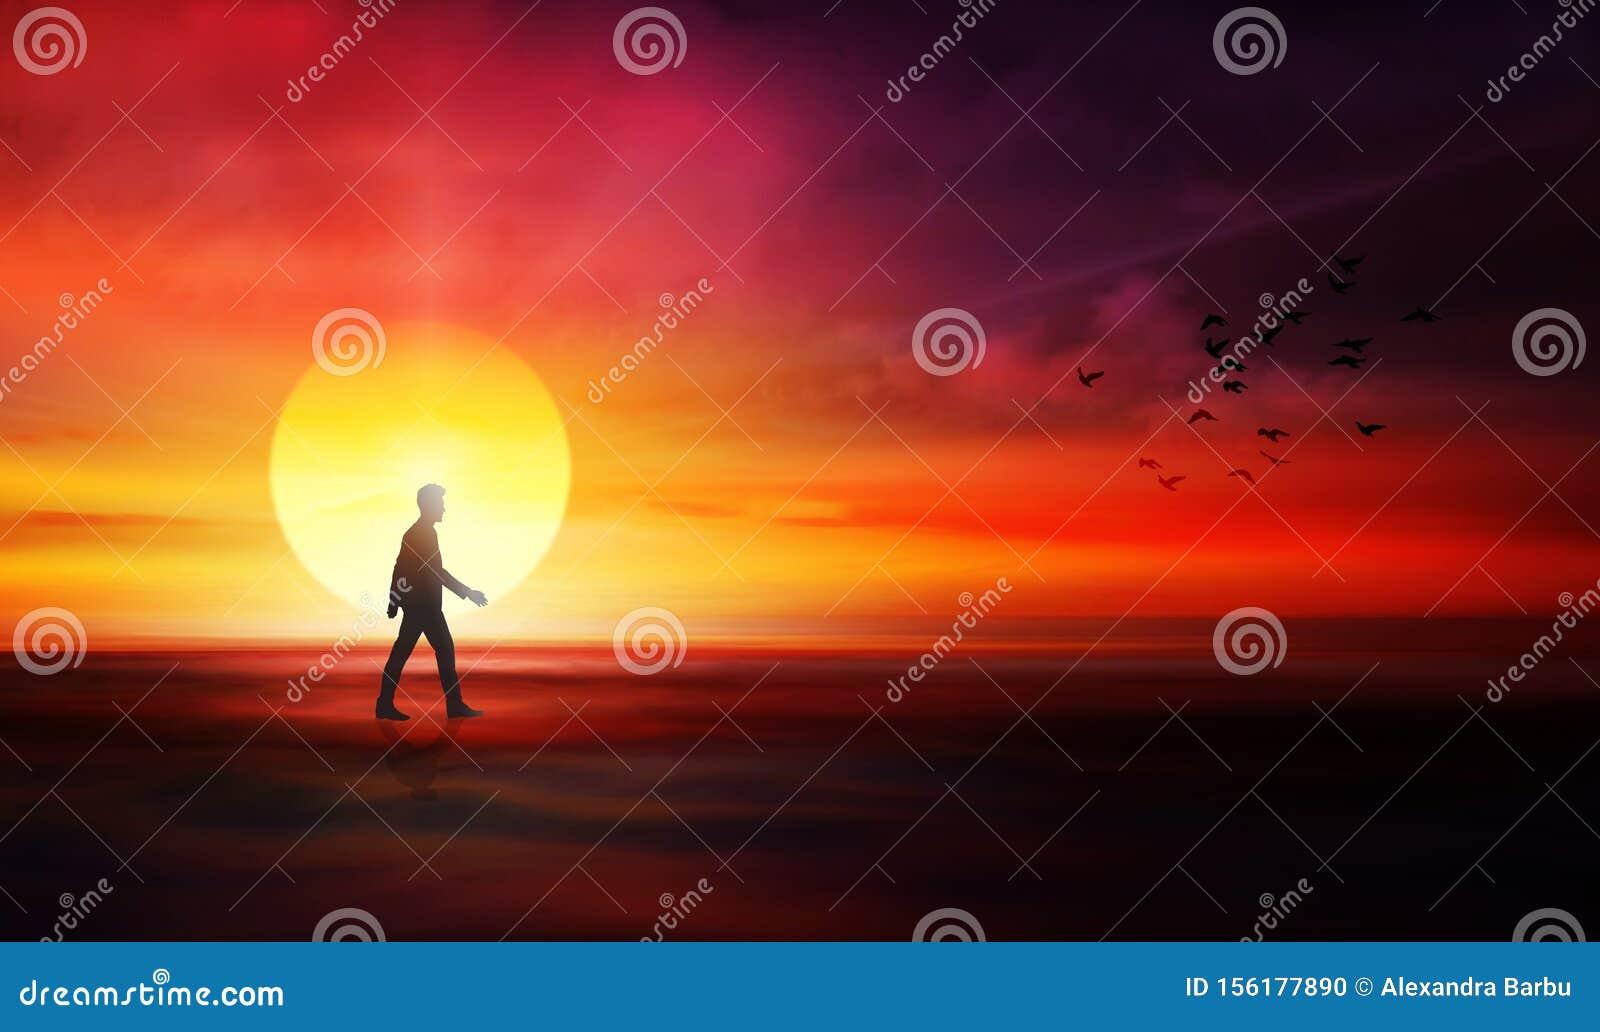 Life journey, path to unknown, destiny, rebirth